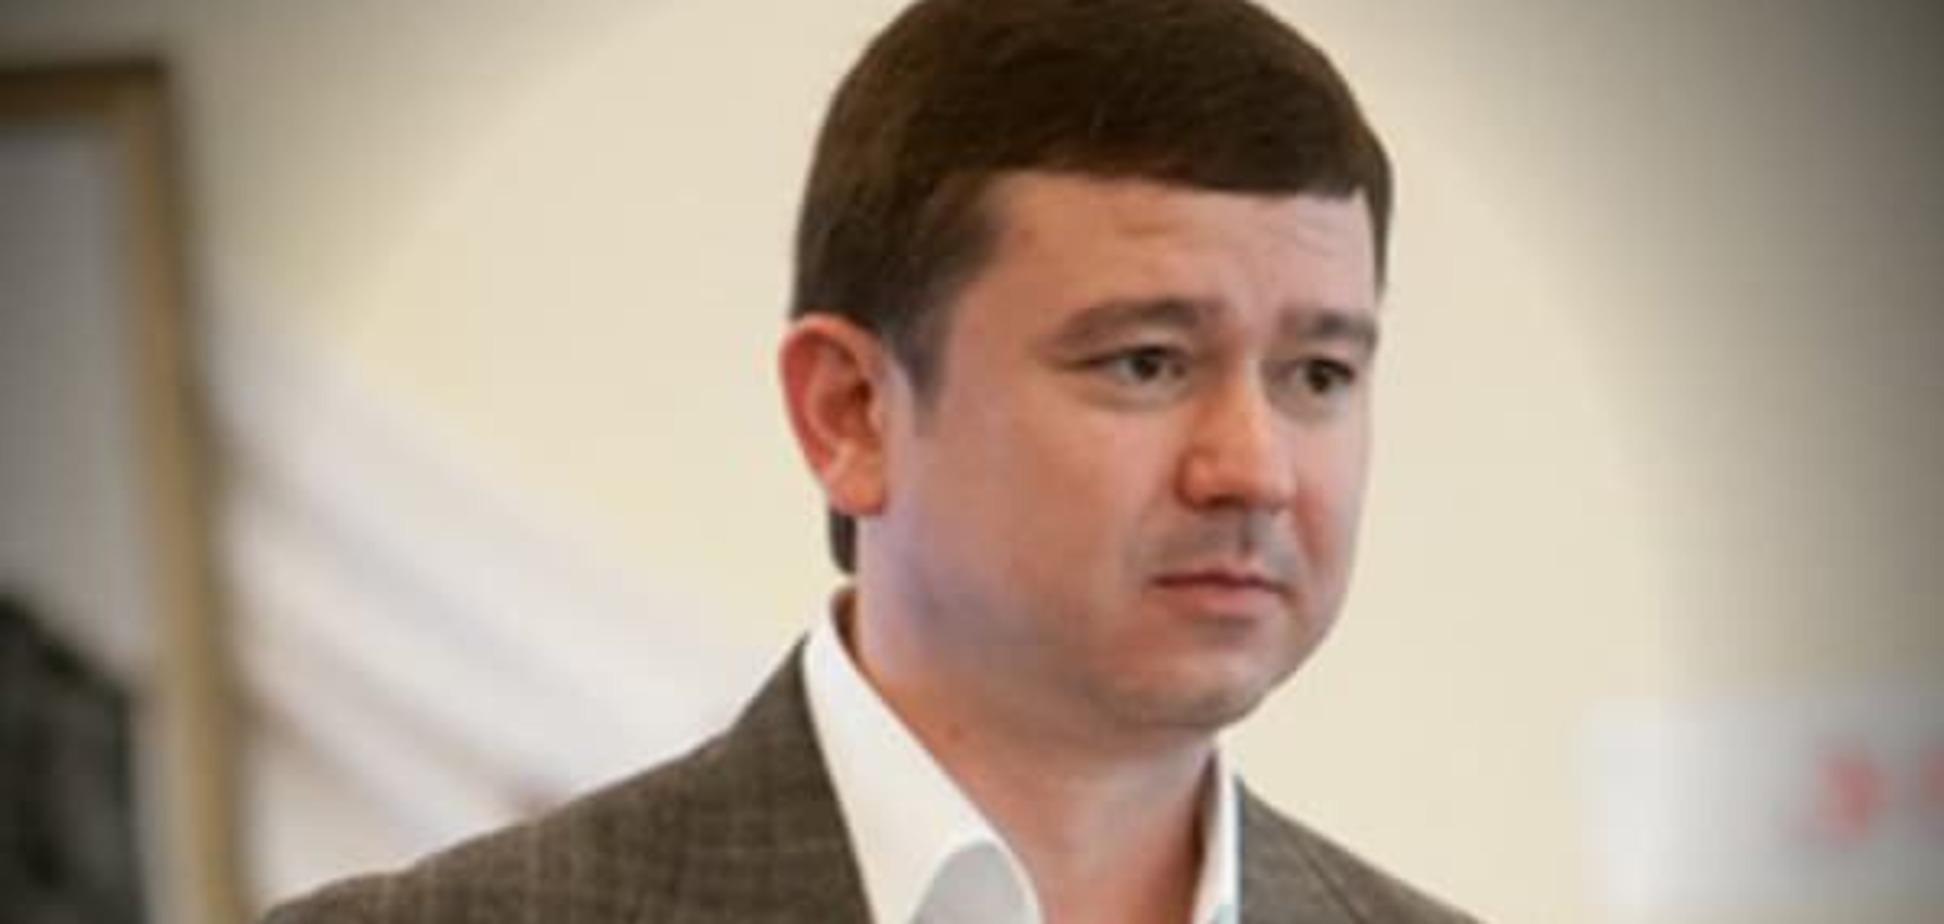 Балога оконфузился, перепутав имя Президента Украины: фотофакт